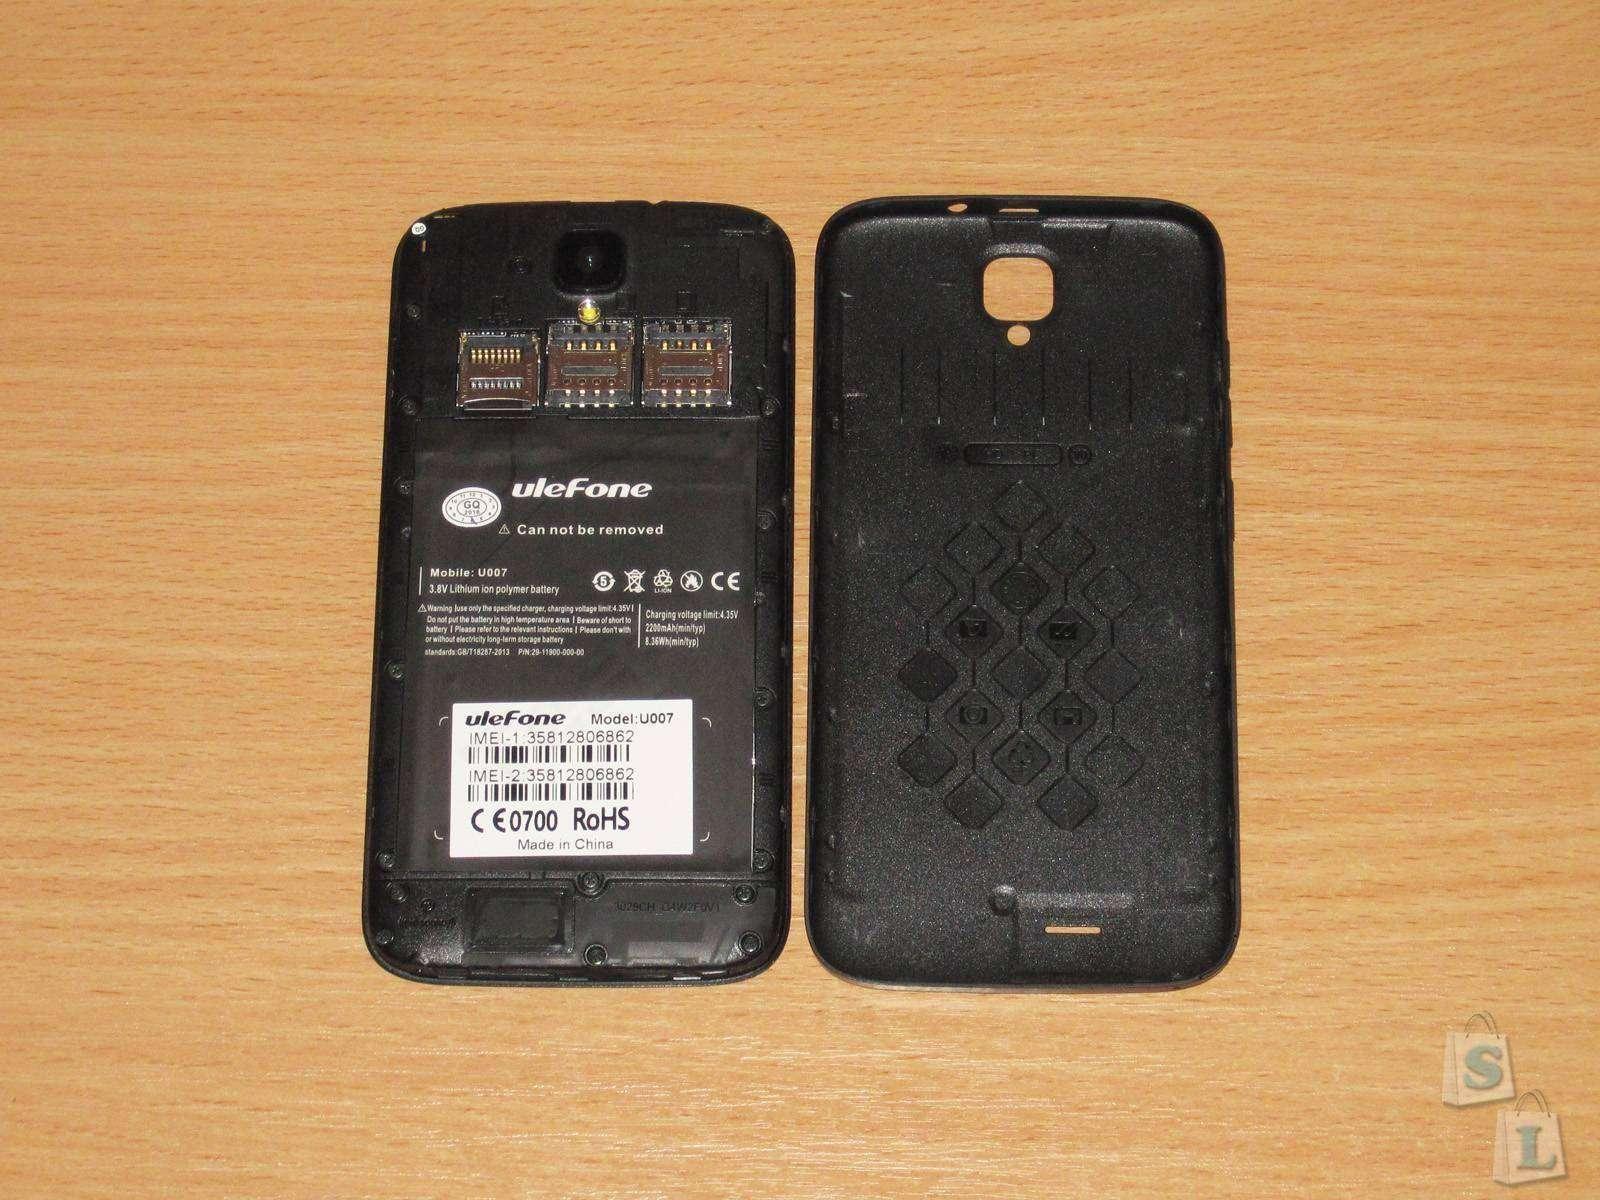 GearBest: Ulefone U007, обзор еще одного смартфона